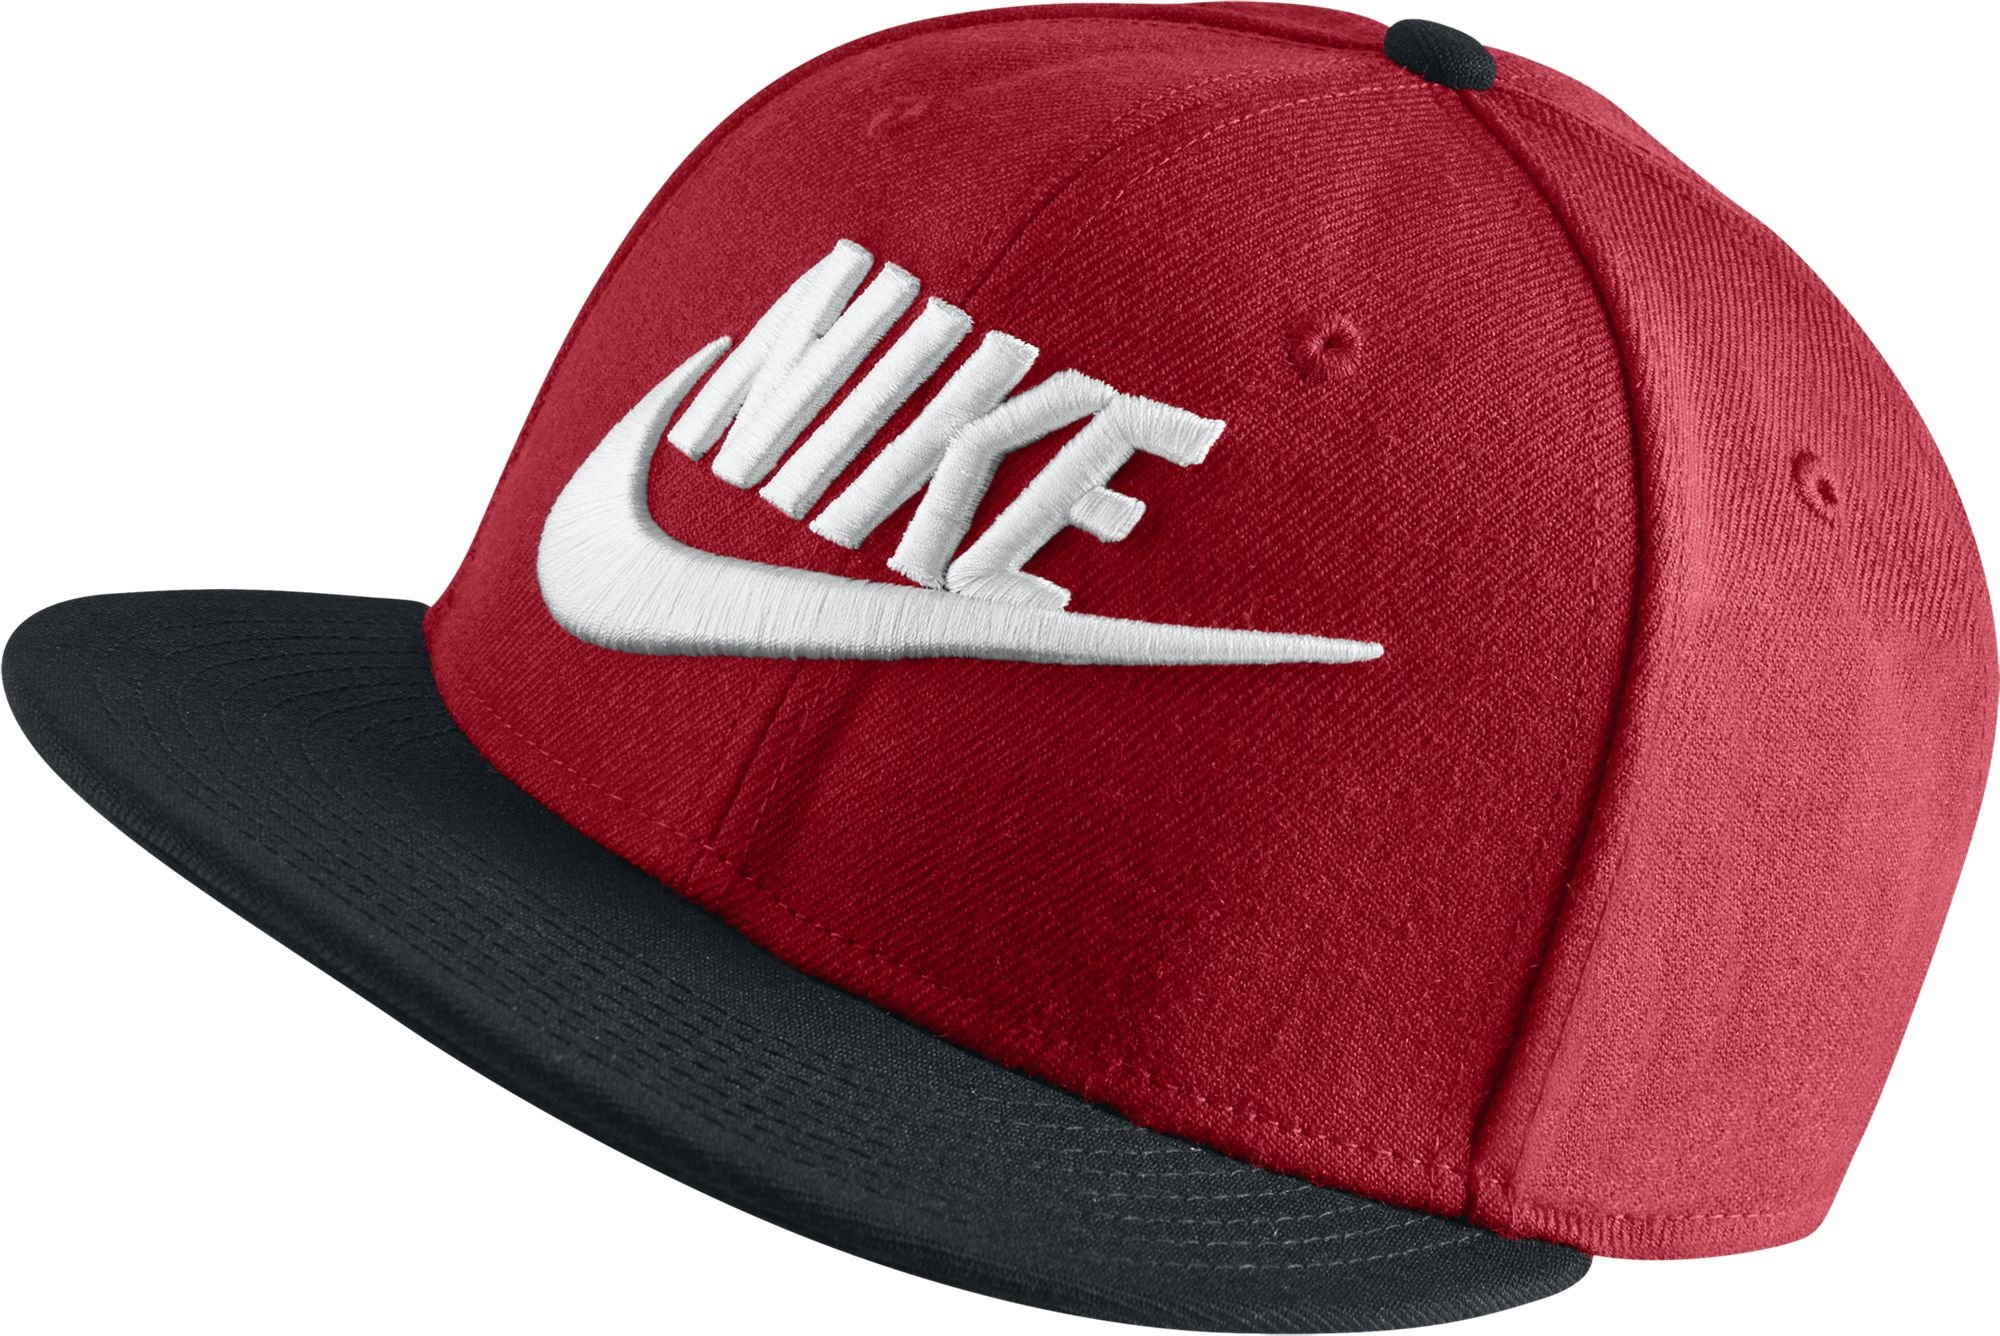 613ddb8ae03 Galleon - NIKE Mens Futura True 2 Adjustable Snapback Hat University Red  Black 584169-659